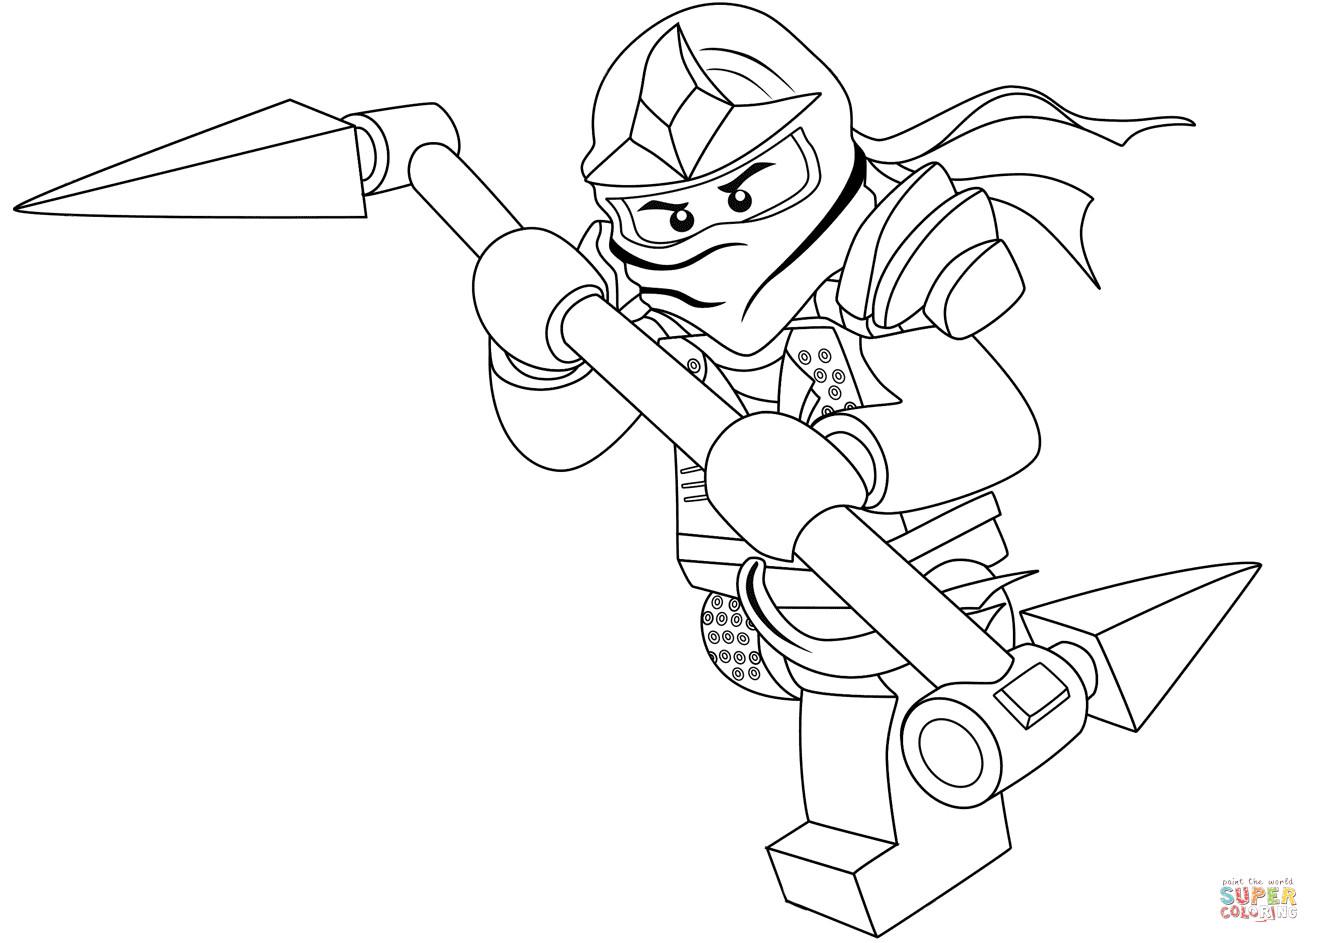 Ausmalbilder Ninjago Lloyd  Ninjago Lloyd coloring page